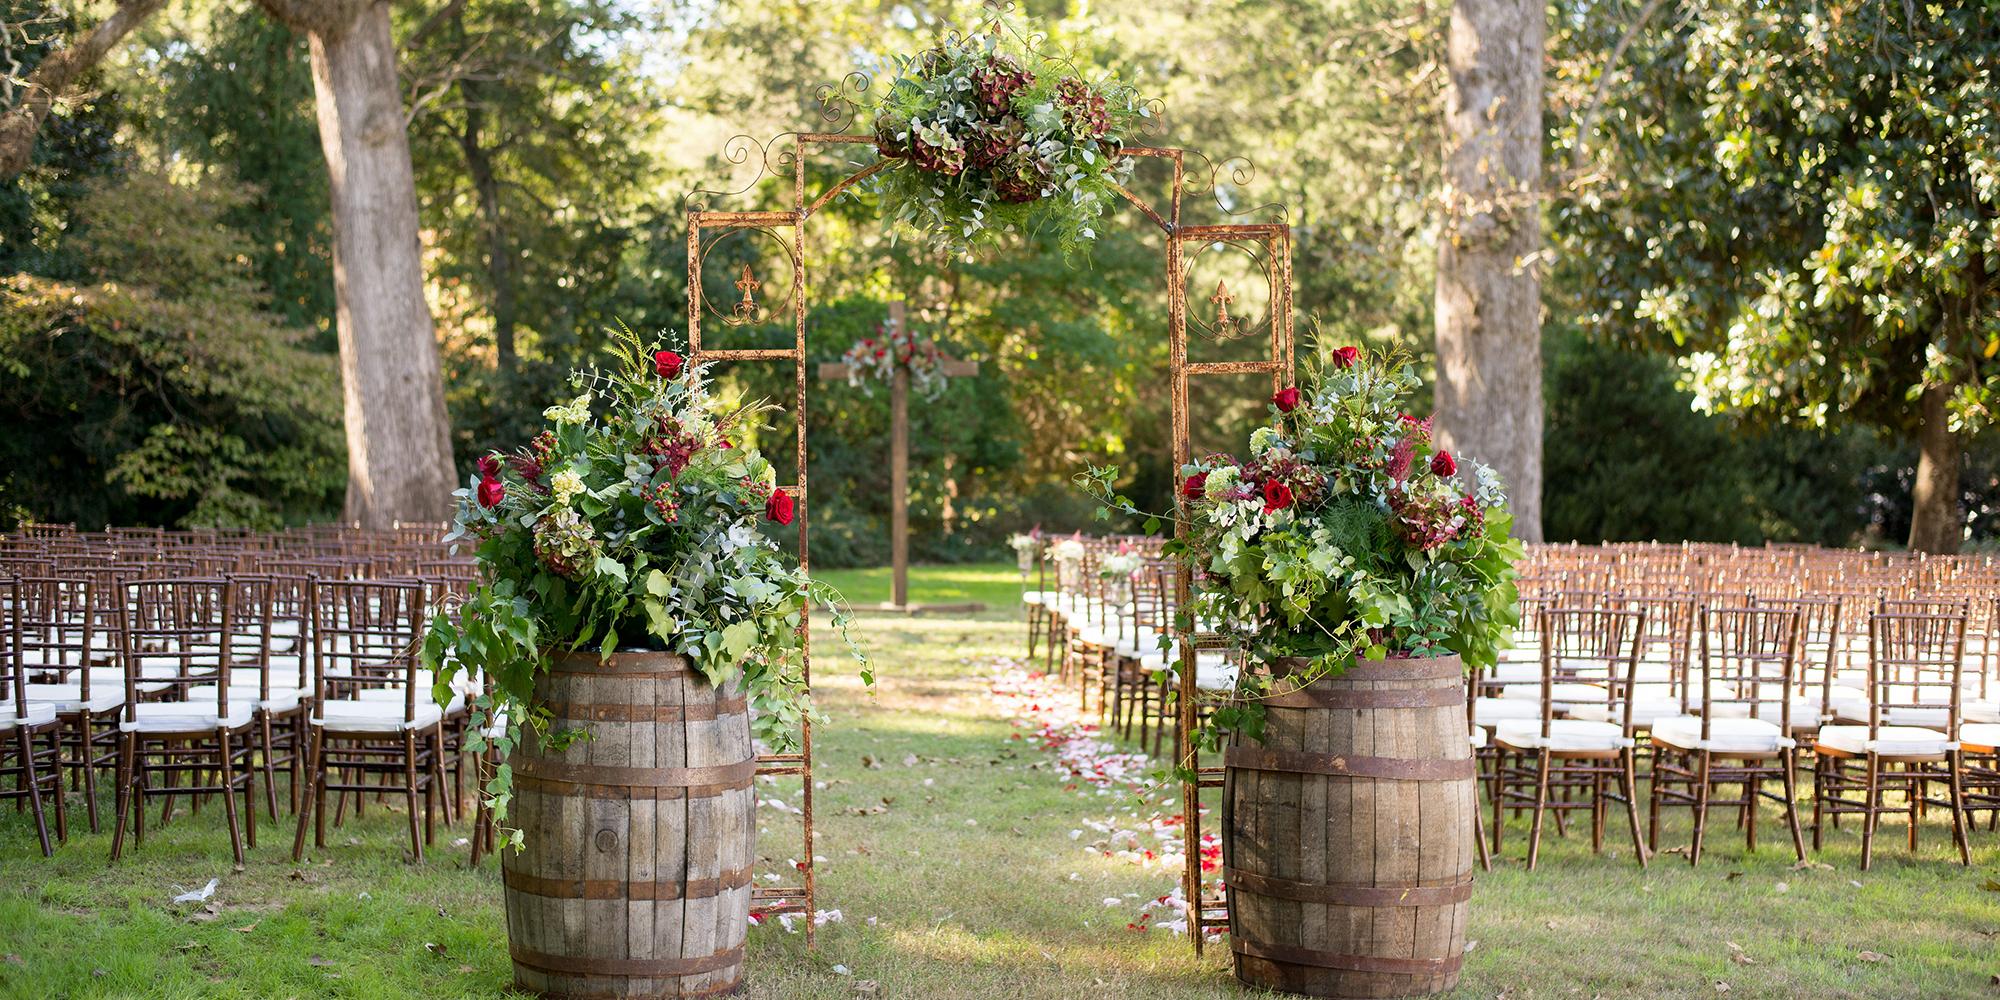 chair rentals for wedding design garden fruitwood chiavari rental by oconee events